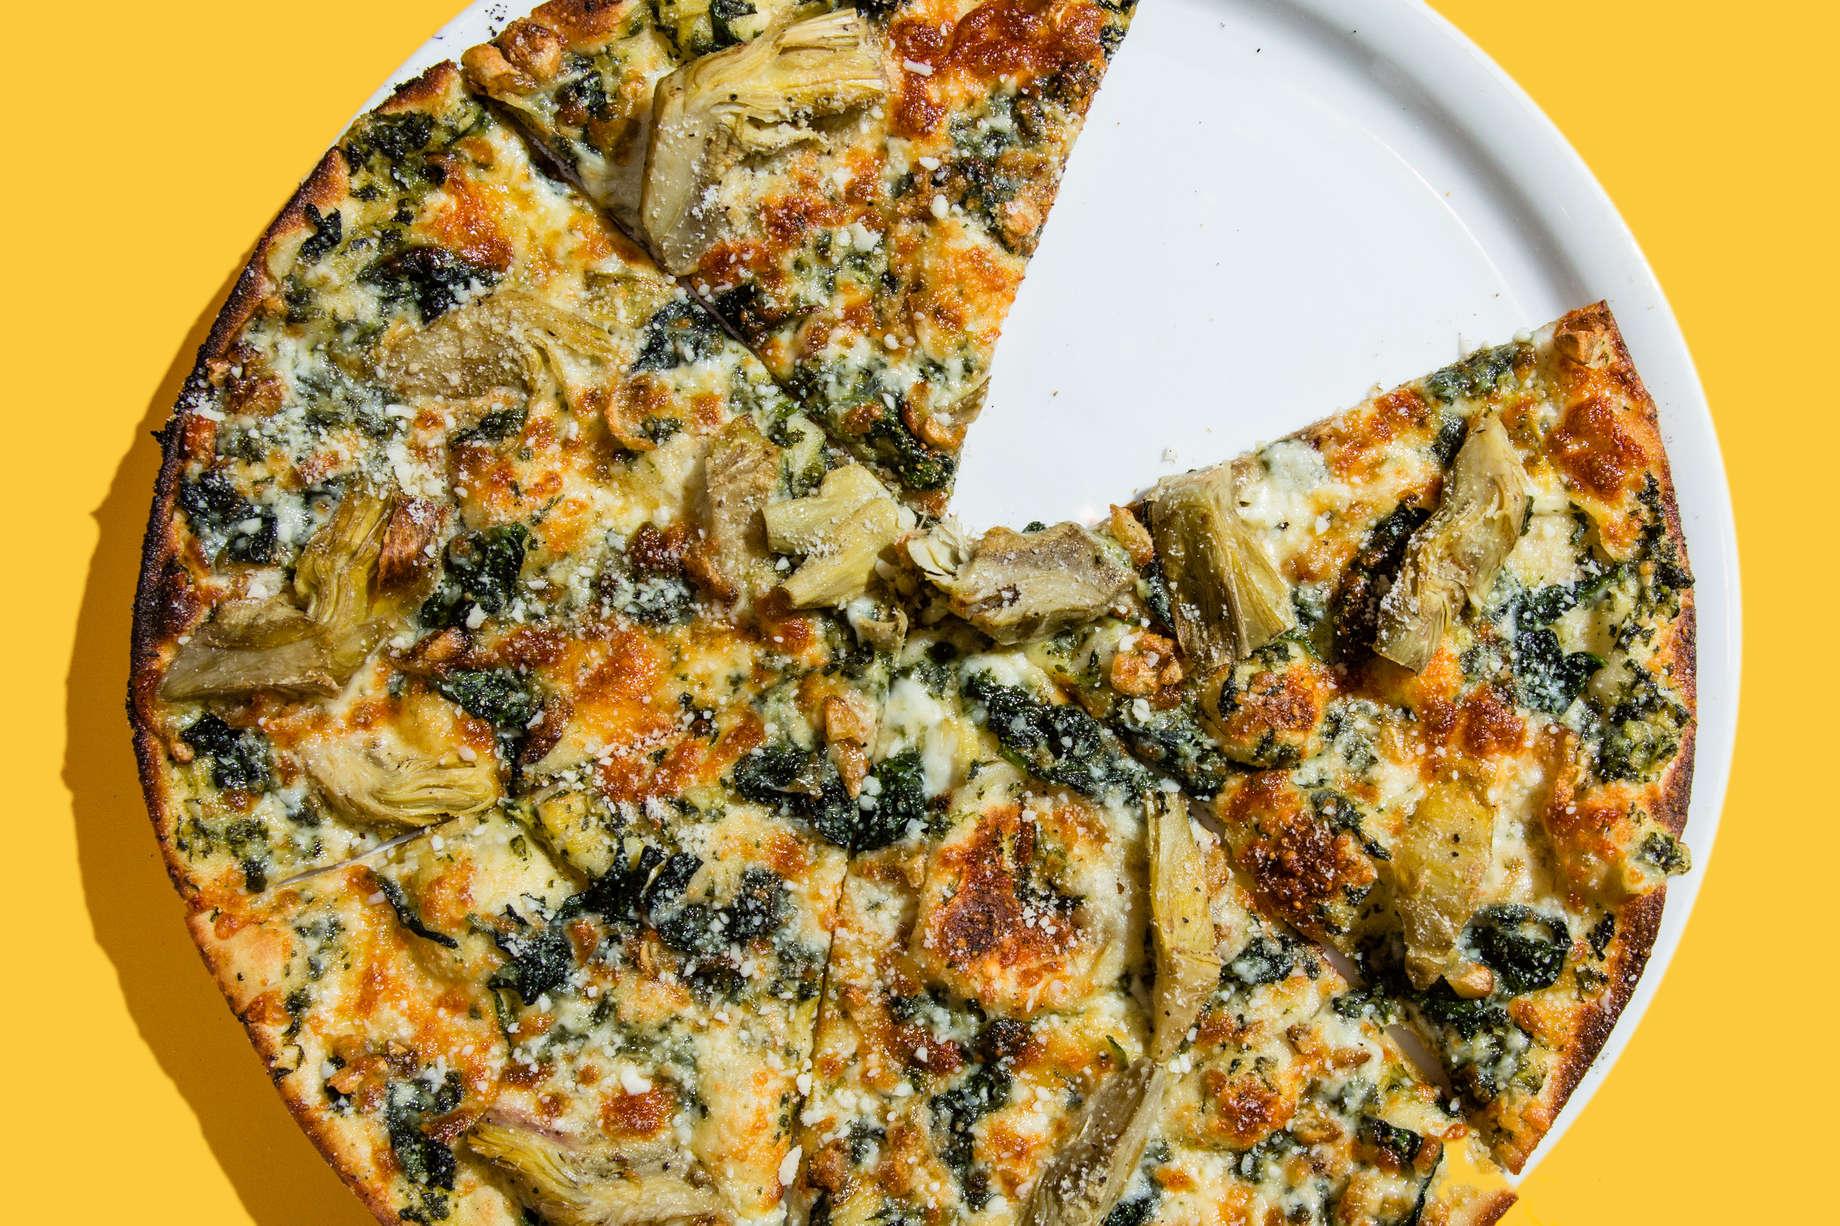 Tremendous Best California Pizza Kitchen Pizzas Every Cpk Pizza Pie Interior Design Ideas Clesiryabchikinfo